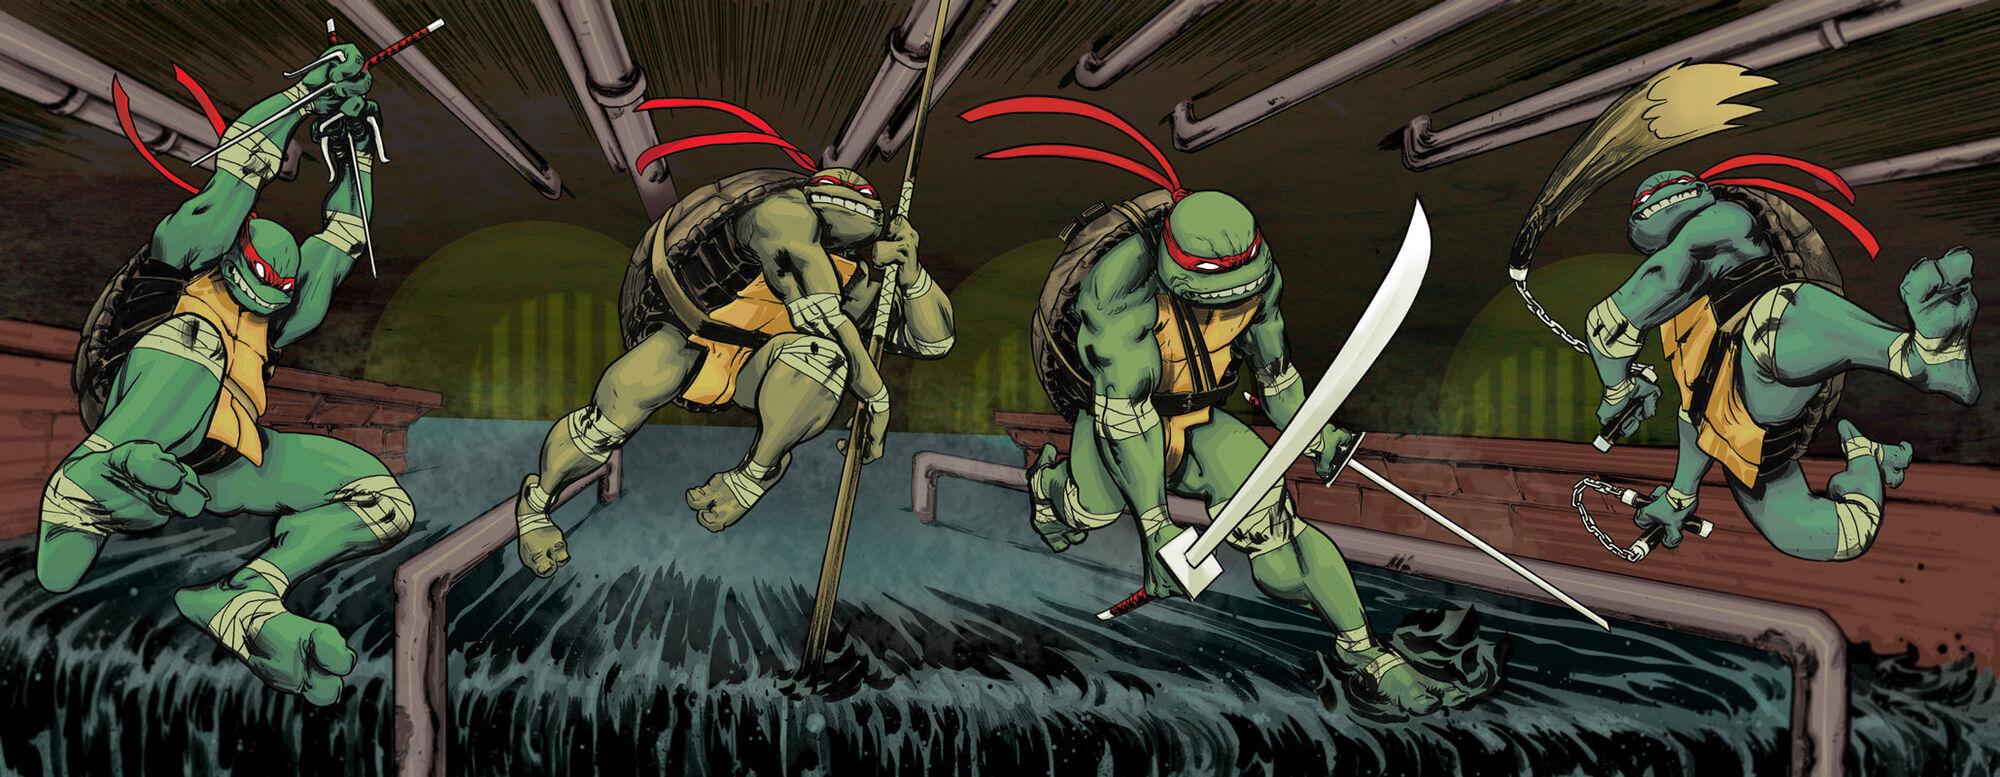 Teenage Mutant Ninja Turtles Idw Tmntpedia Fandom Powered By Wikia